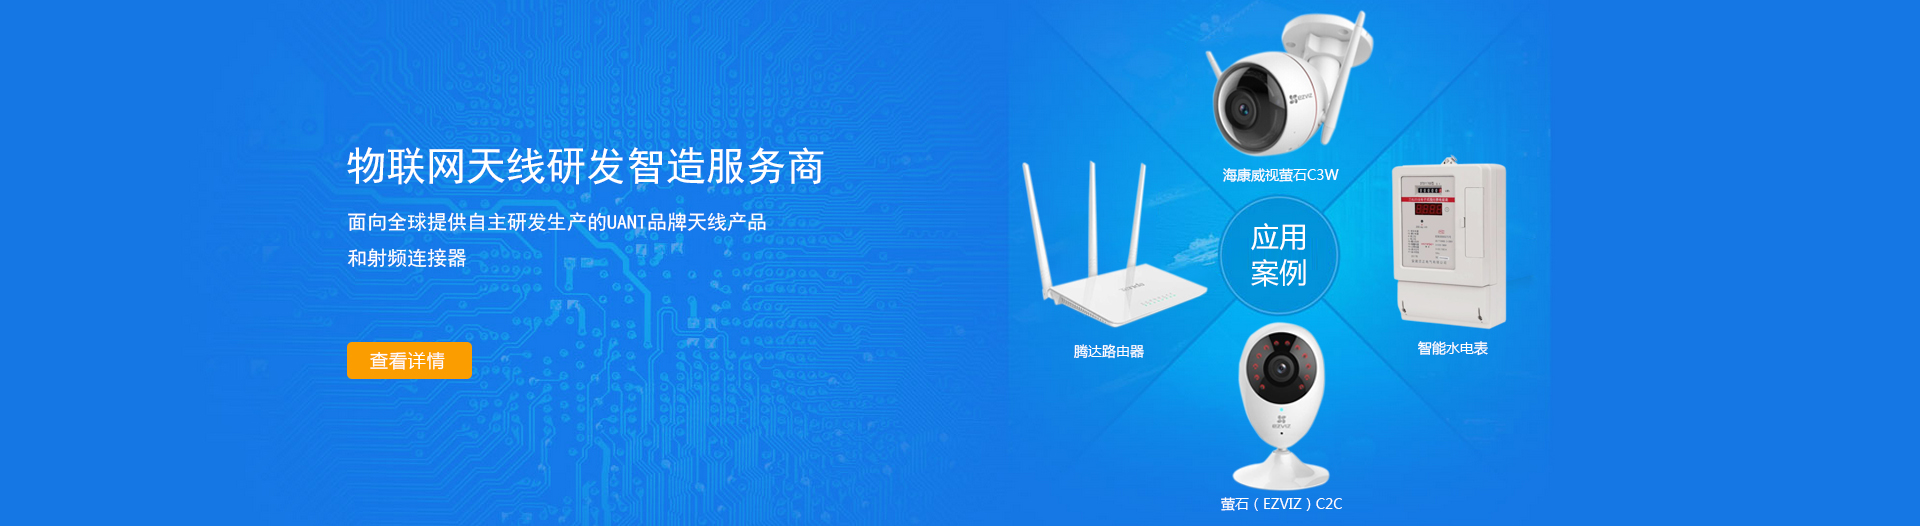 2.4G天线,WIFI天线,天线厂家,全向天线,外置天线,3G天线,东莞市优比电子有限企业